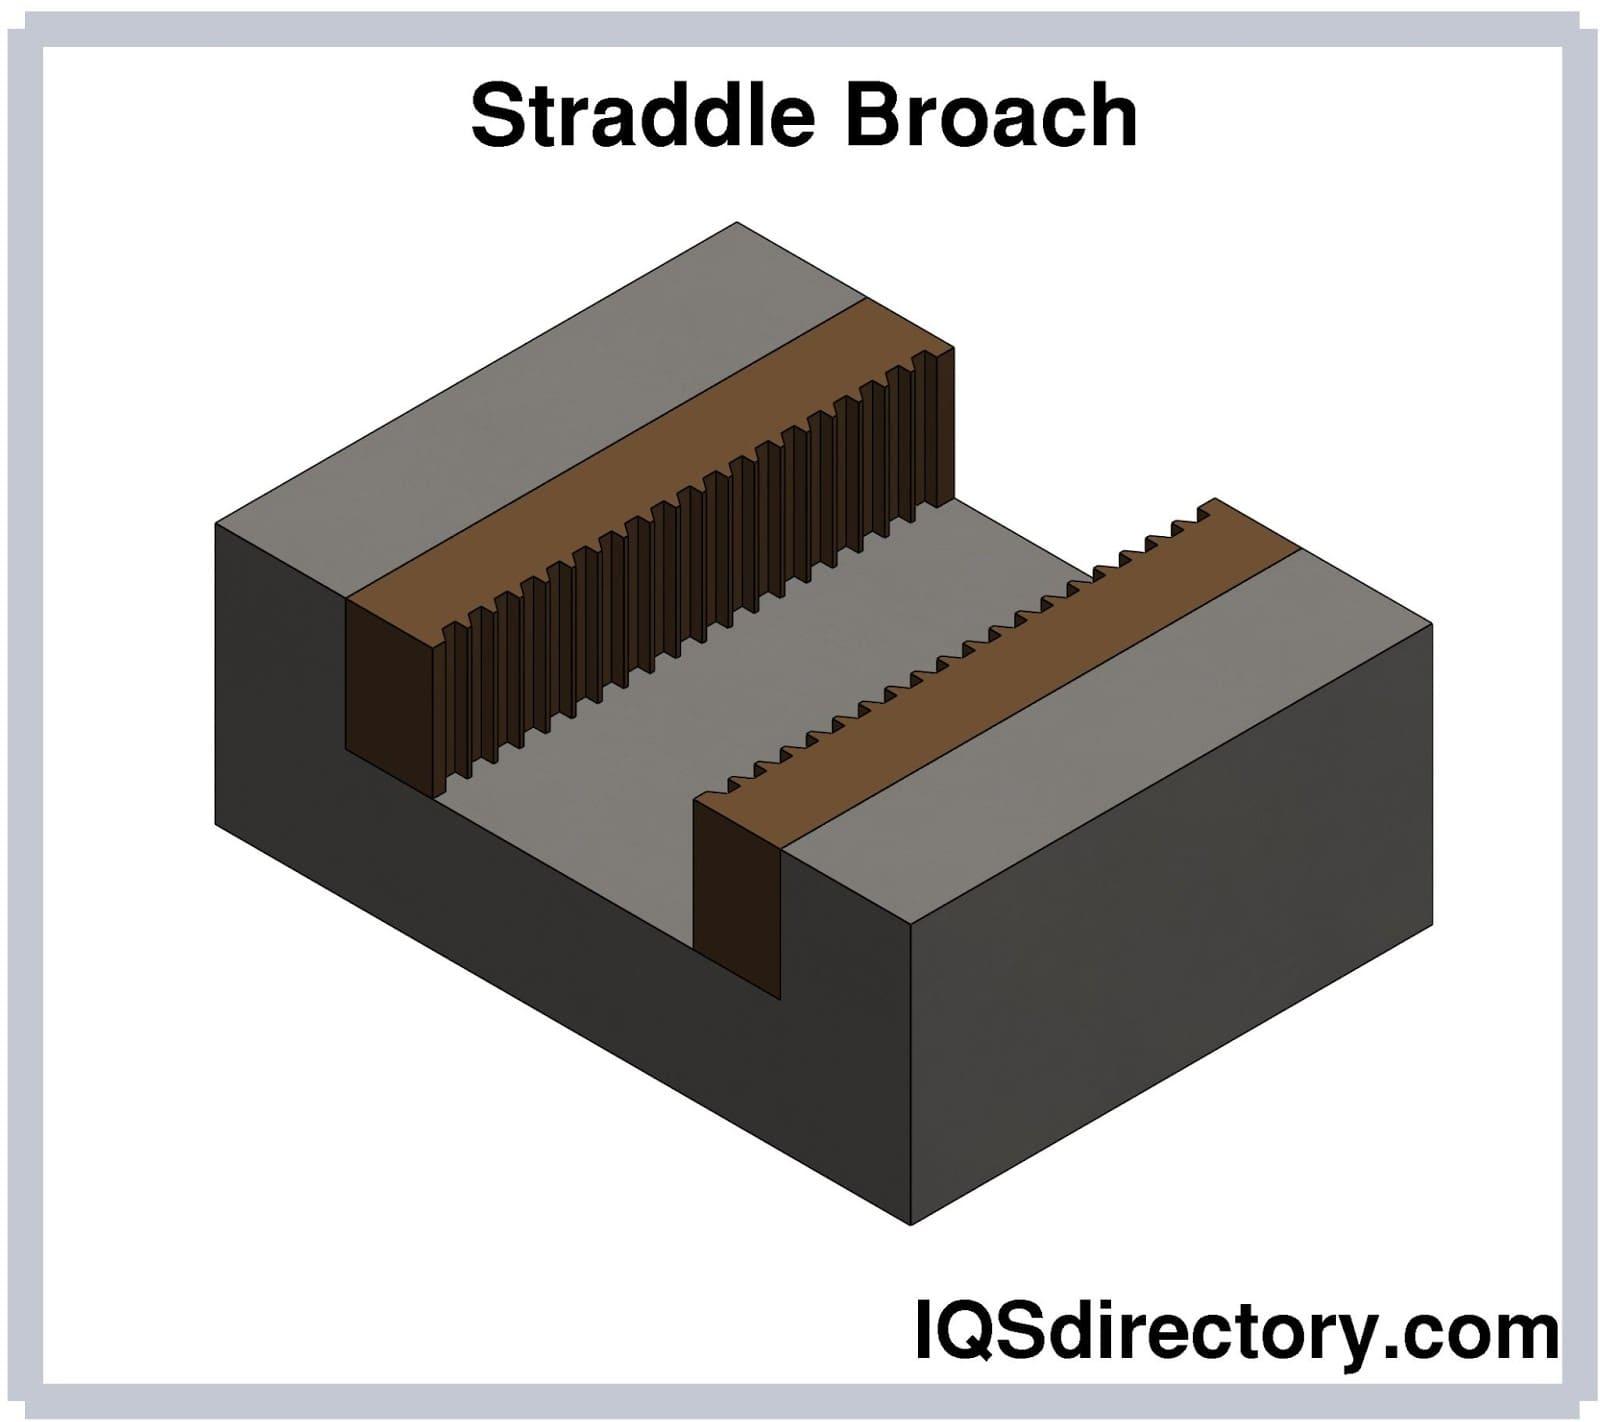 Straddle Broach